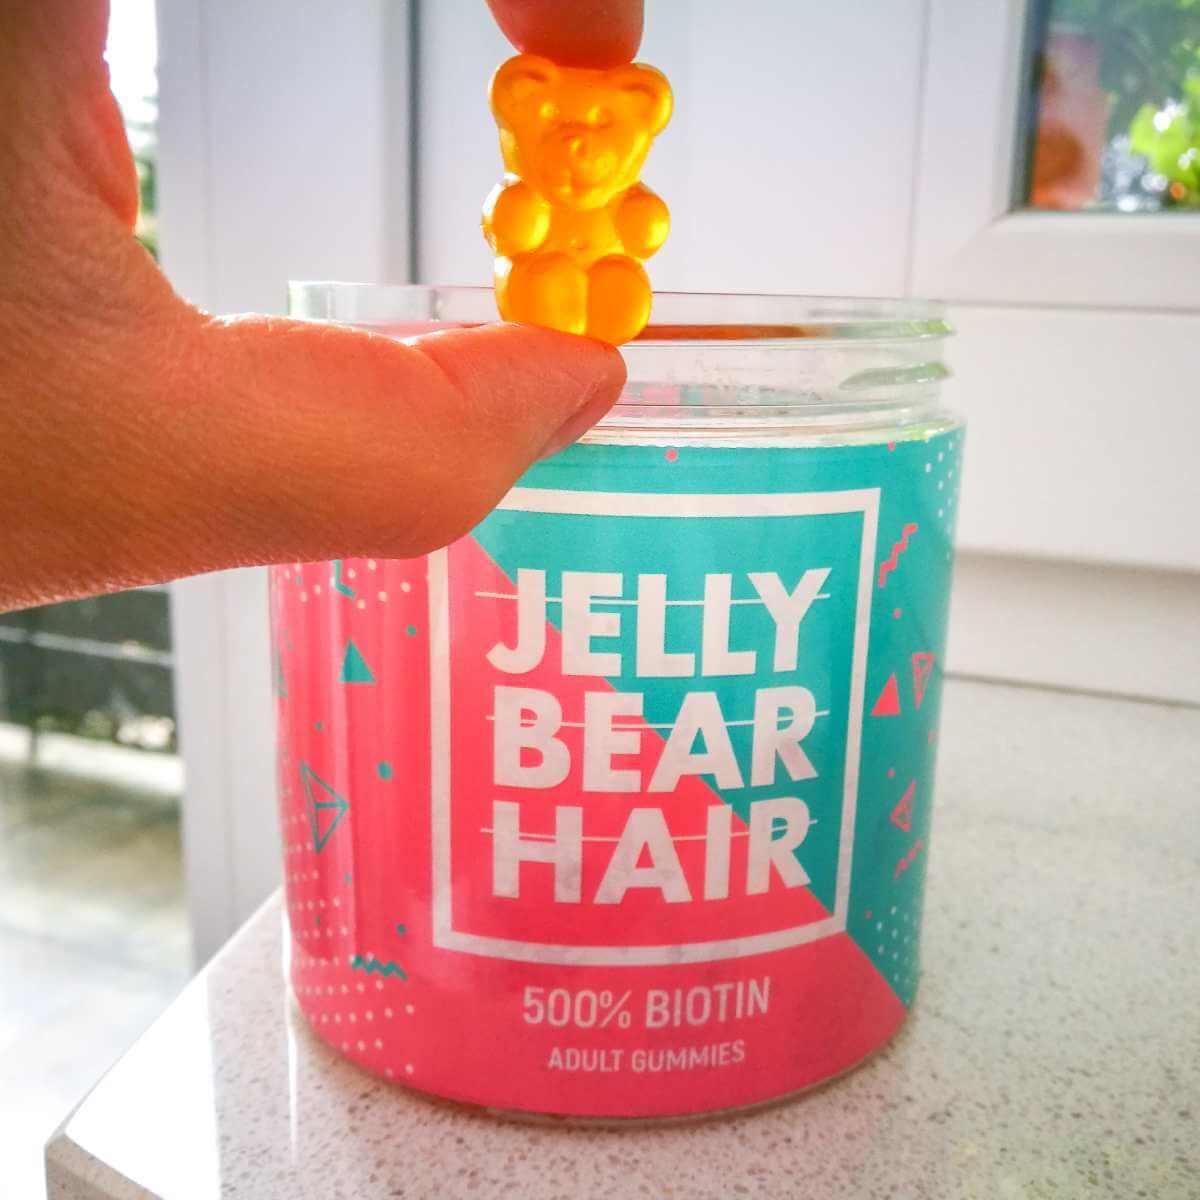 Jelly Bear Hair - cena, skład i opinie